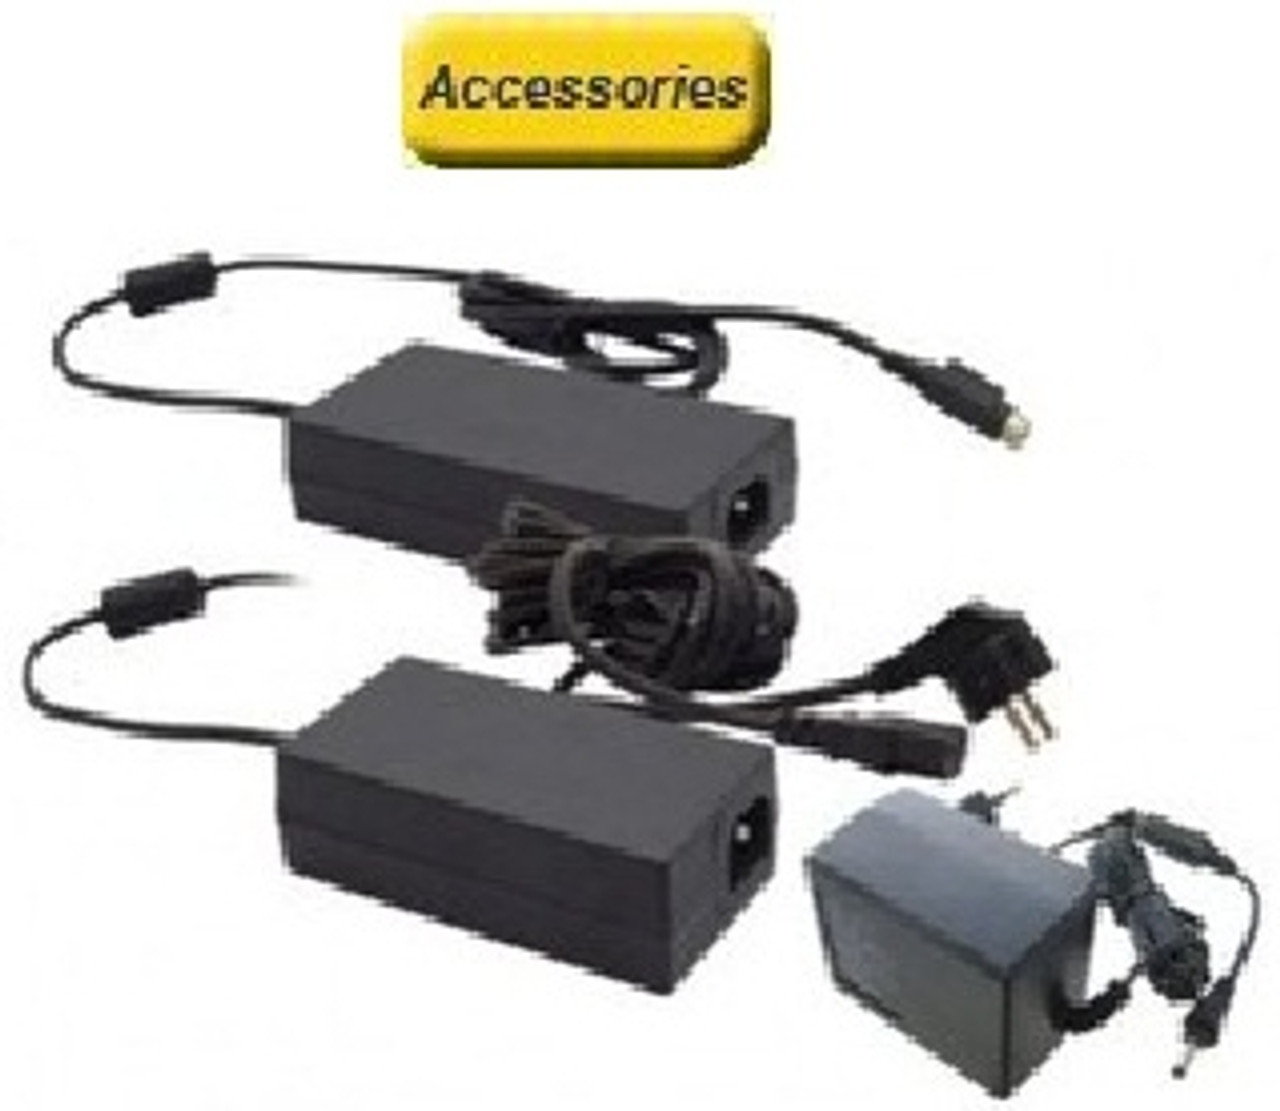 TTP 8200 Accessories